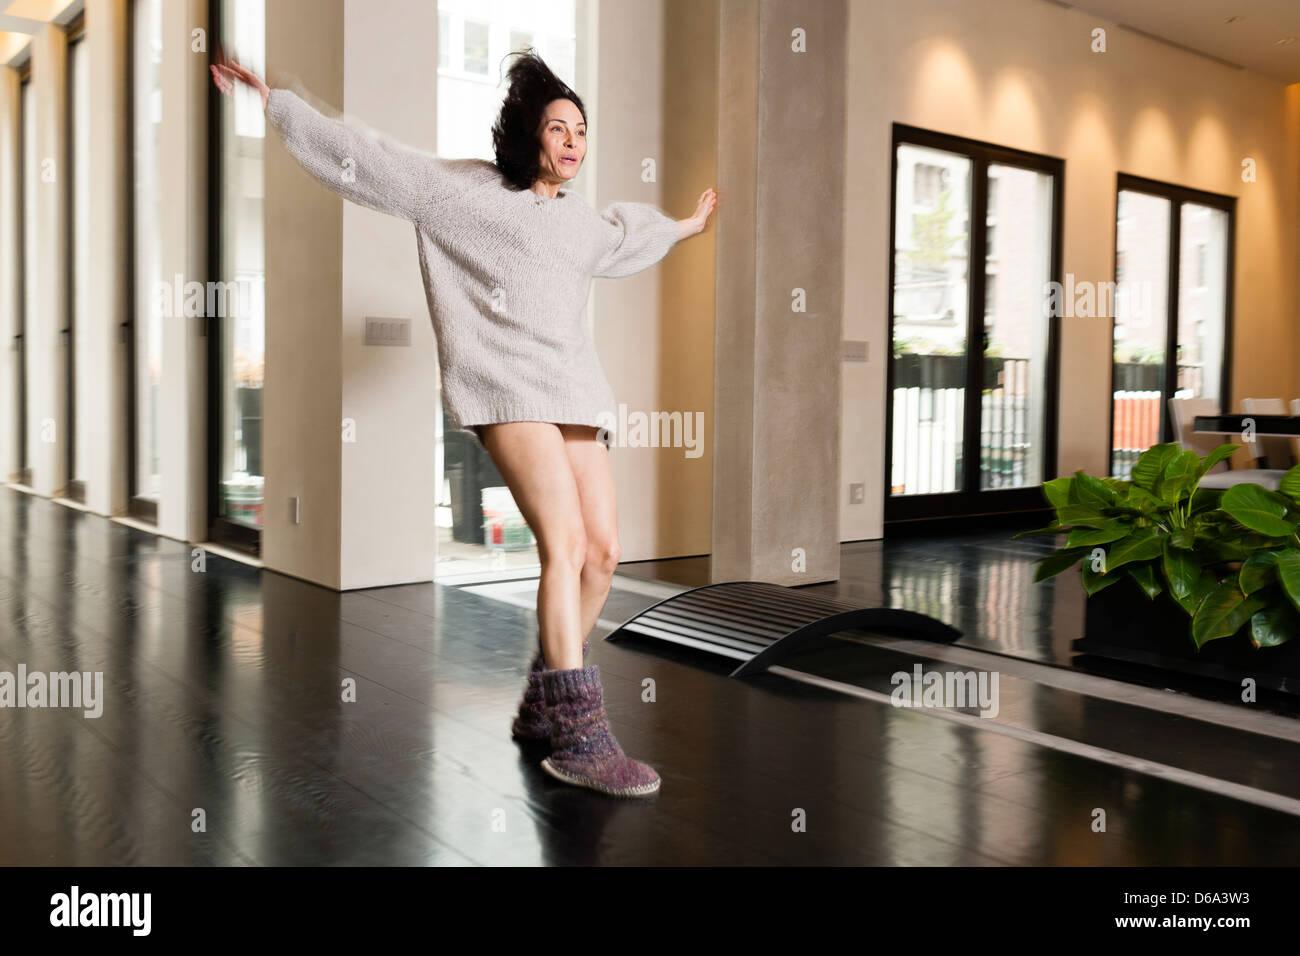 Woman sliding in socks in hallway - Stock Image